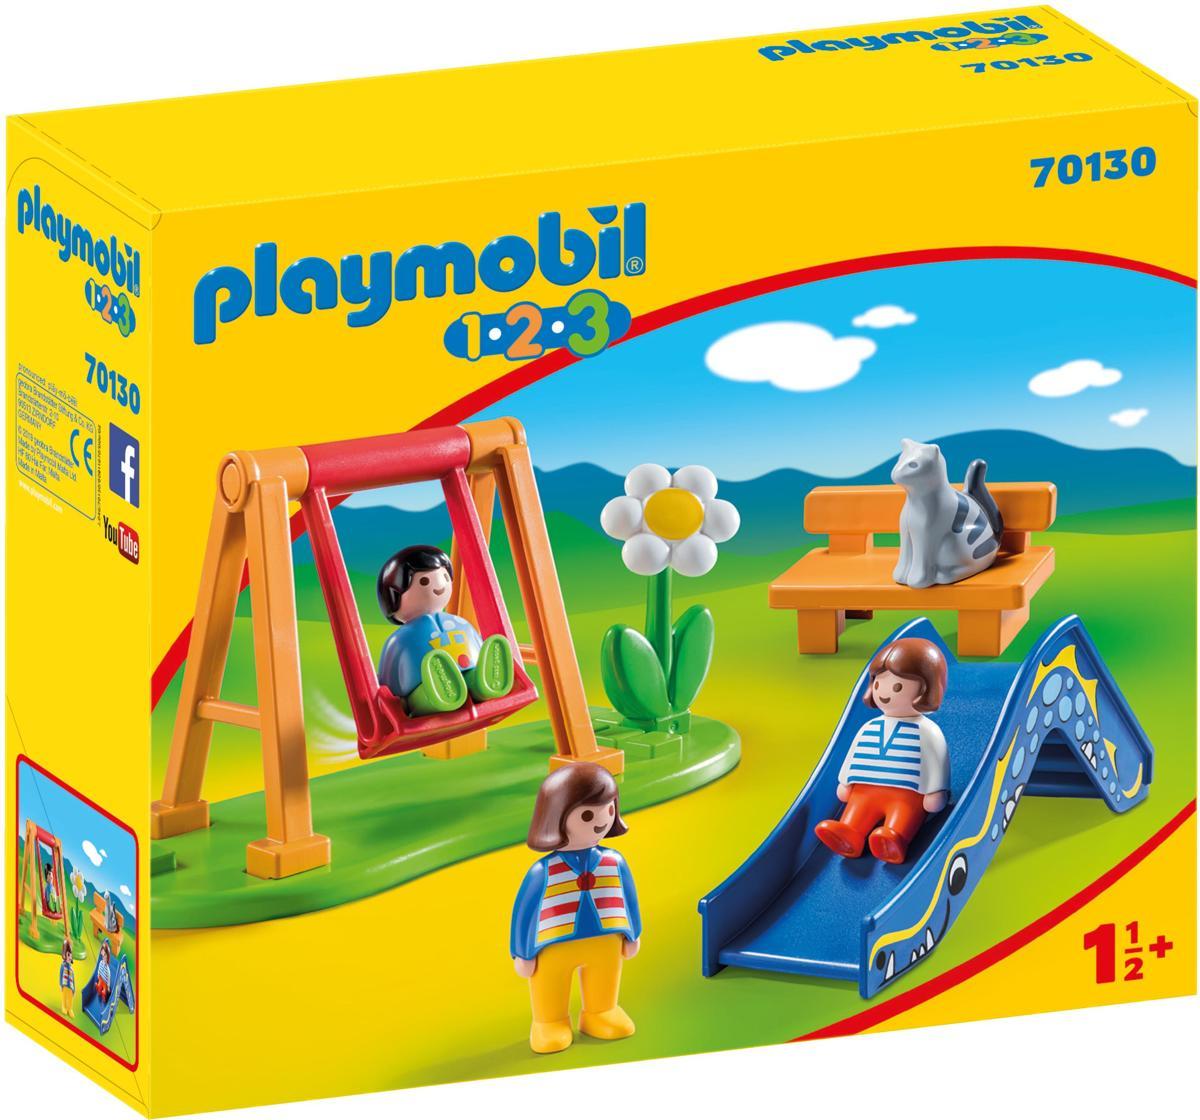 PLAYMOBIL 1.2.3 70130 - Speeltuintje